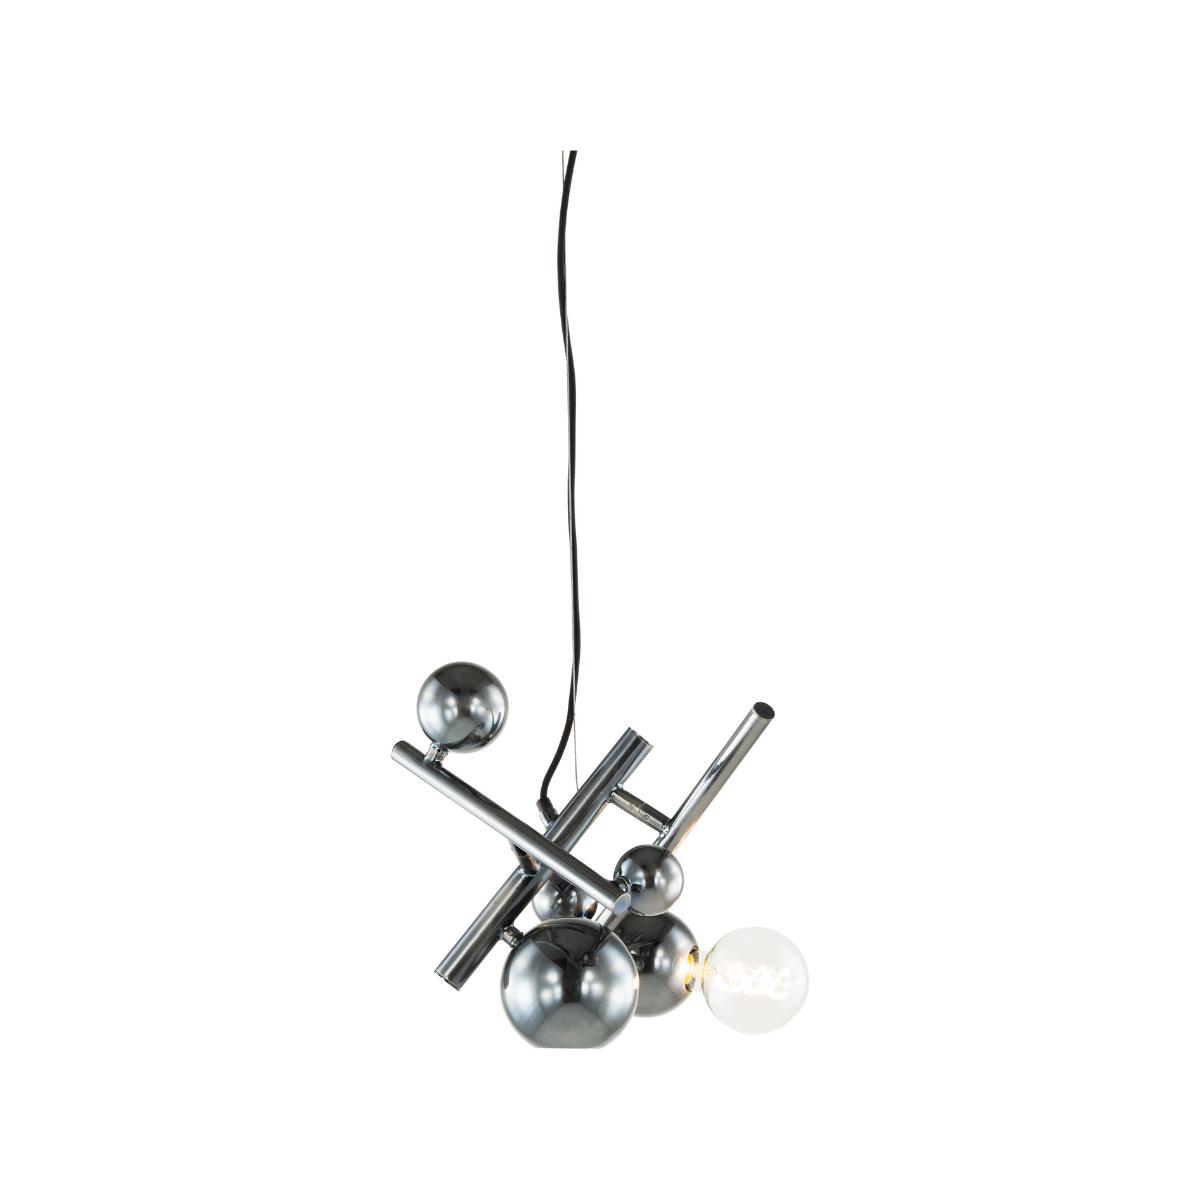 Galaxy Pendant Lamp by Brand Van Egmond